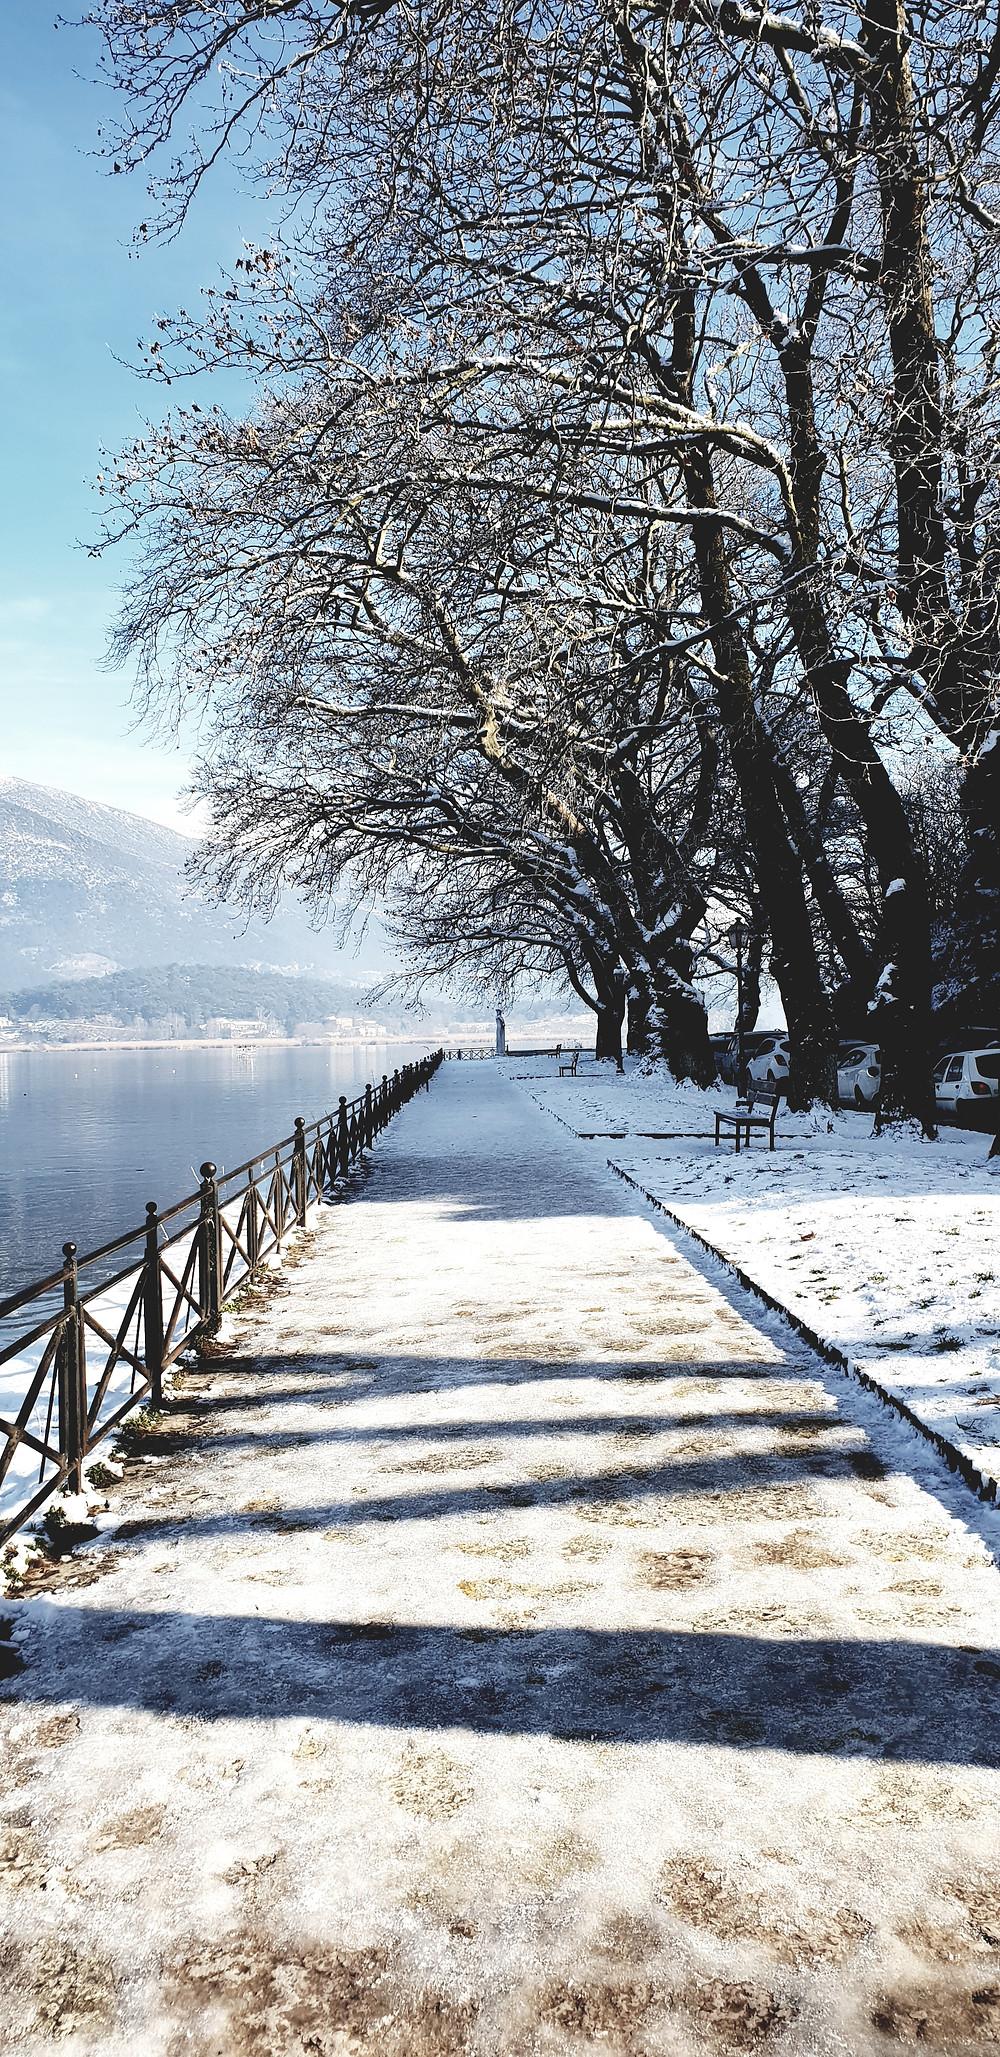 Lake Pamvotis in white - Photo by Mary Samou